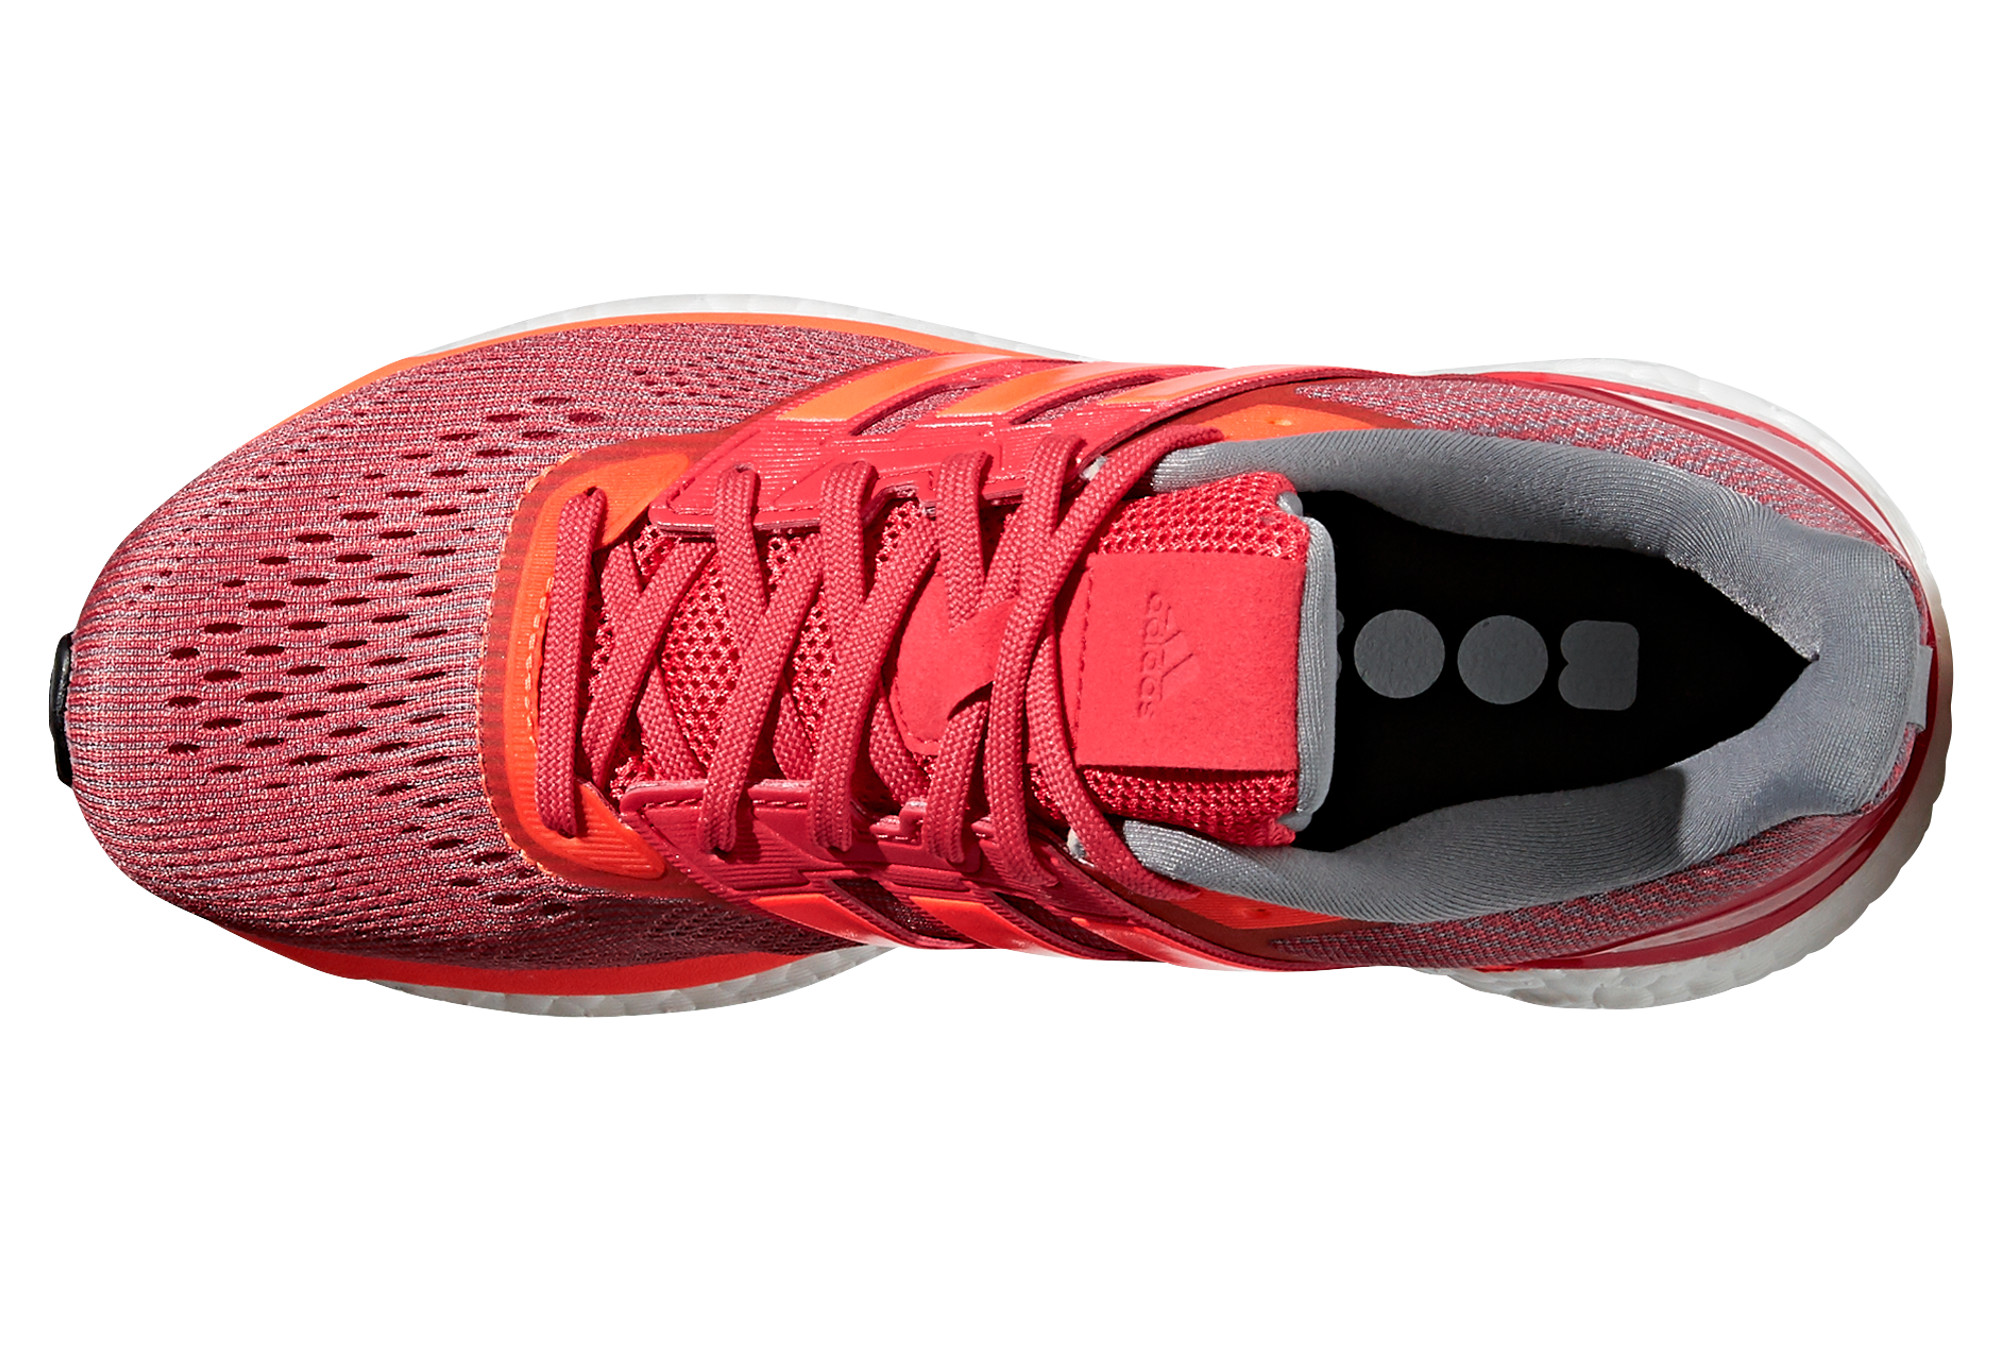 adidas running Supernova femme Orange Rouge Noir